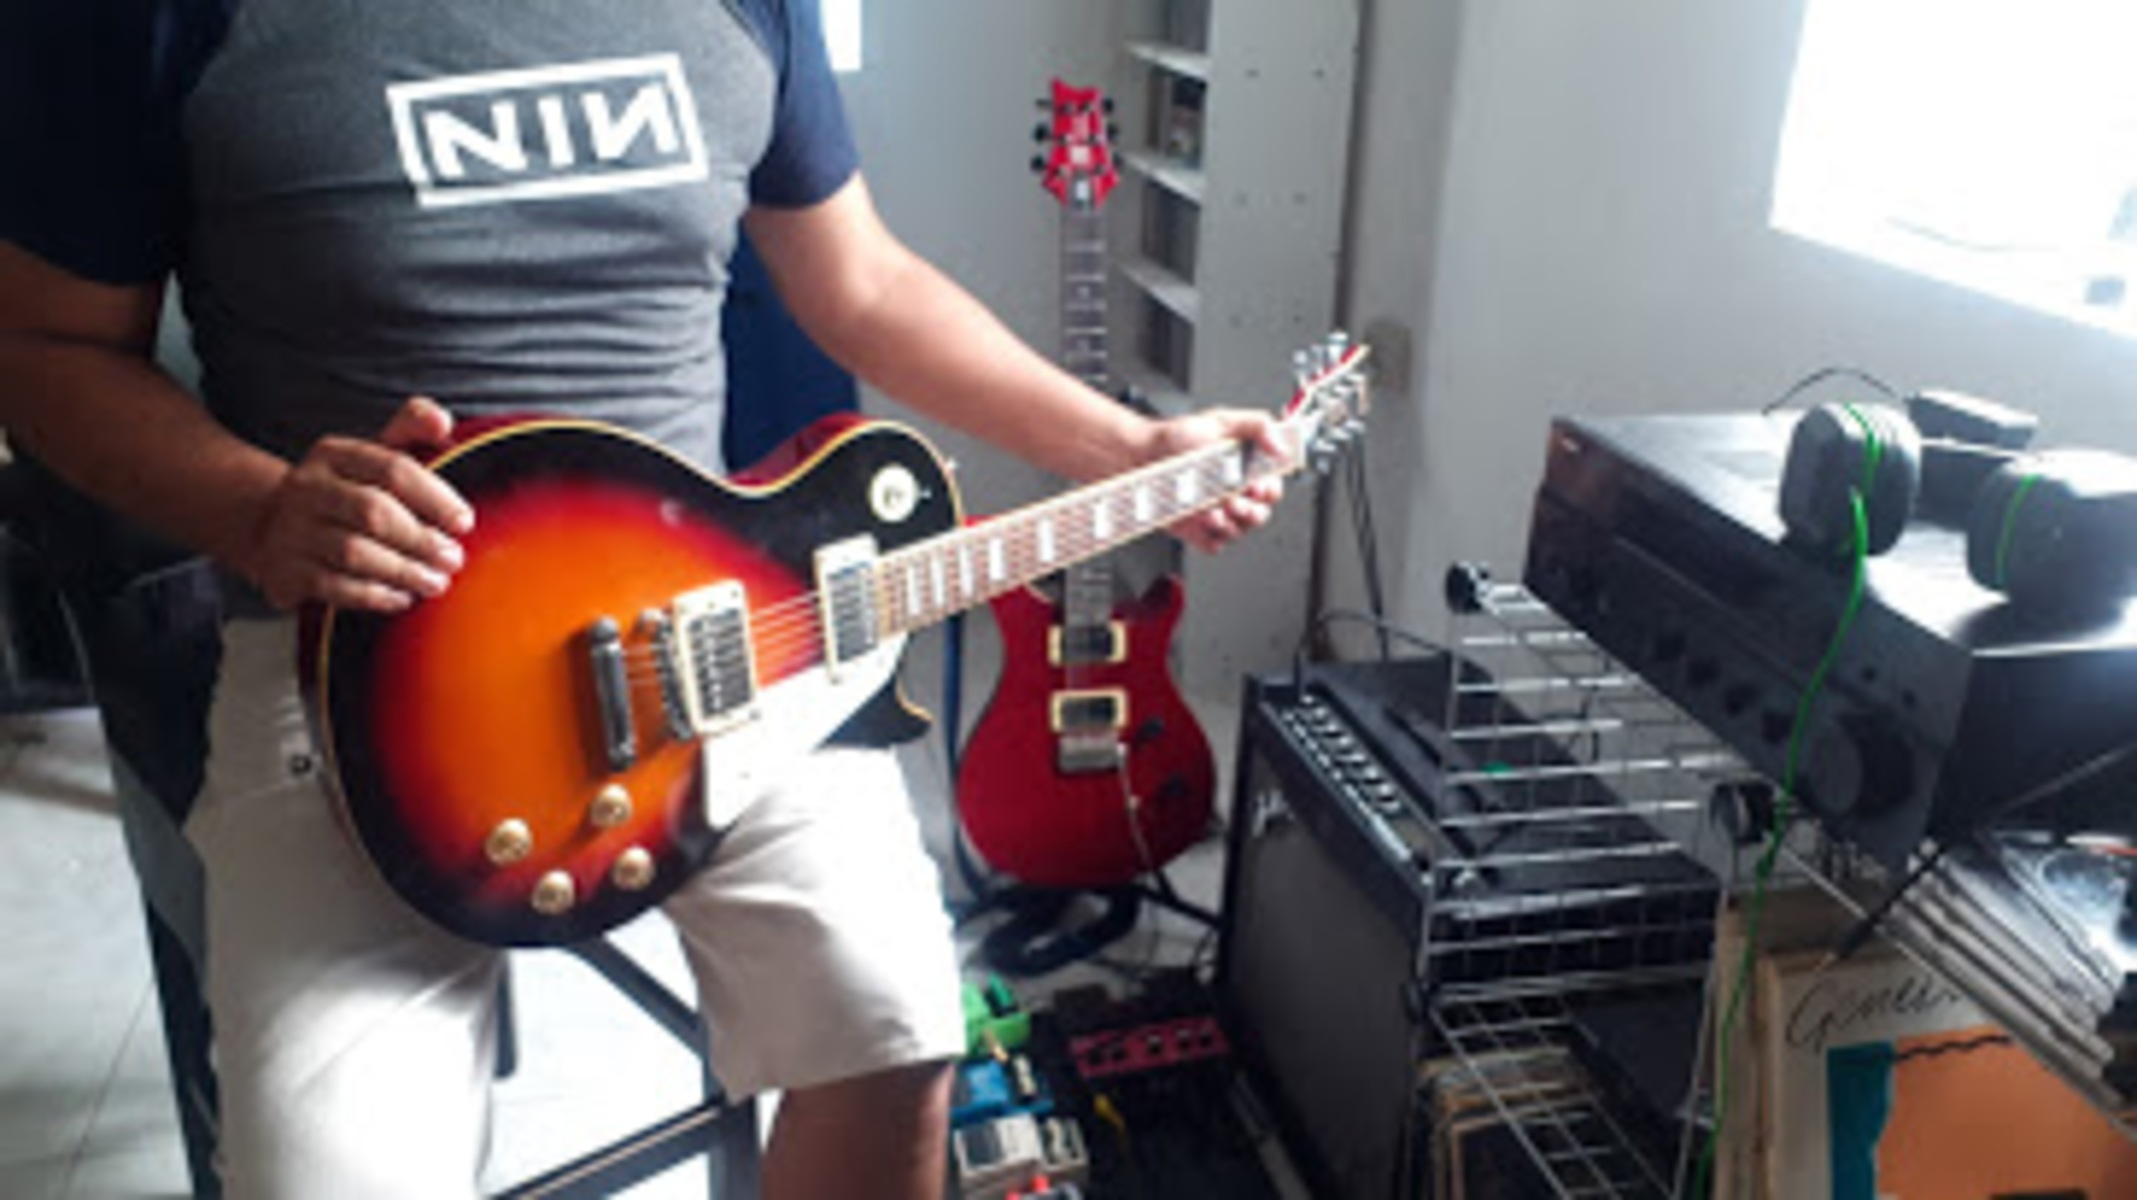 jwettel's pedalboard, guitar, and amplifier photo containing Memphis Les Paul